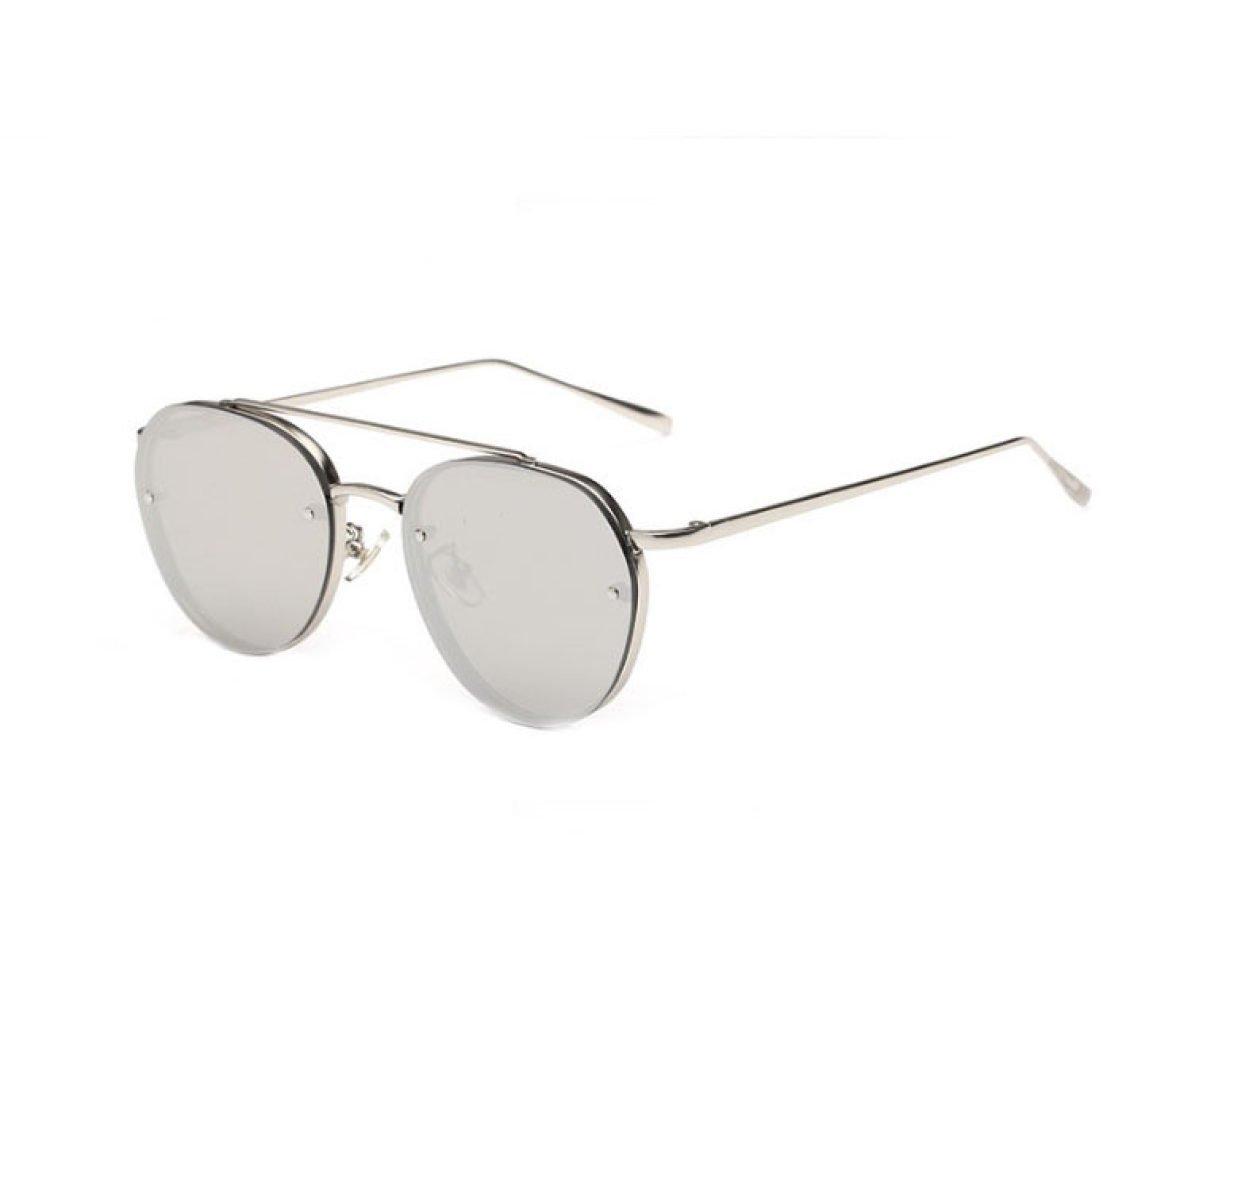 Frau HAOYUXIANG Trend-Sport-Sonnenbrille,C6